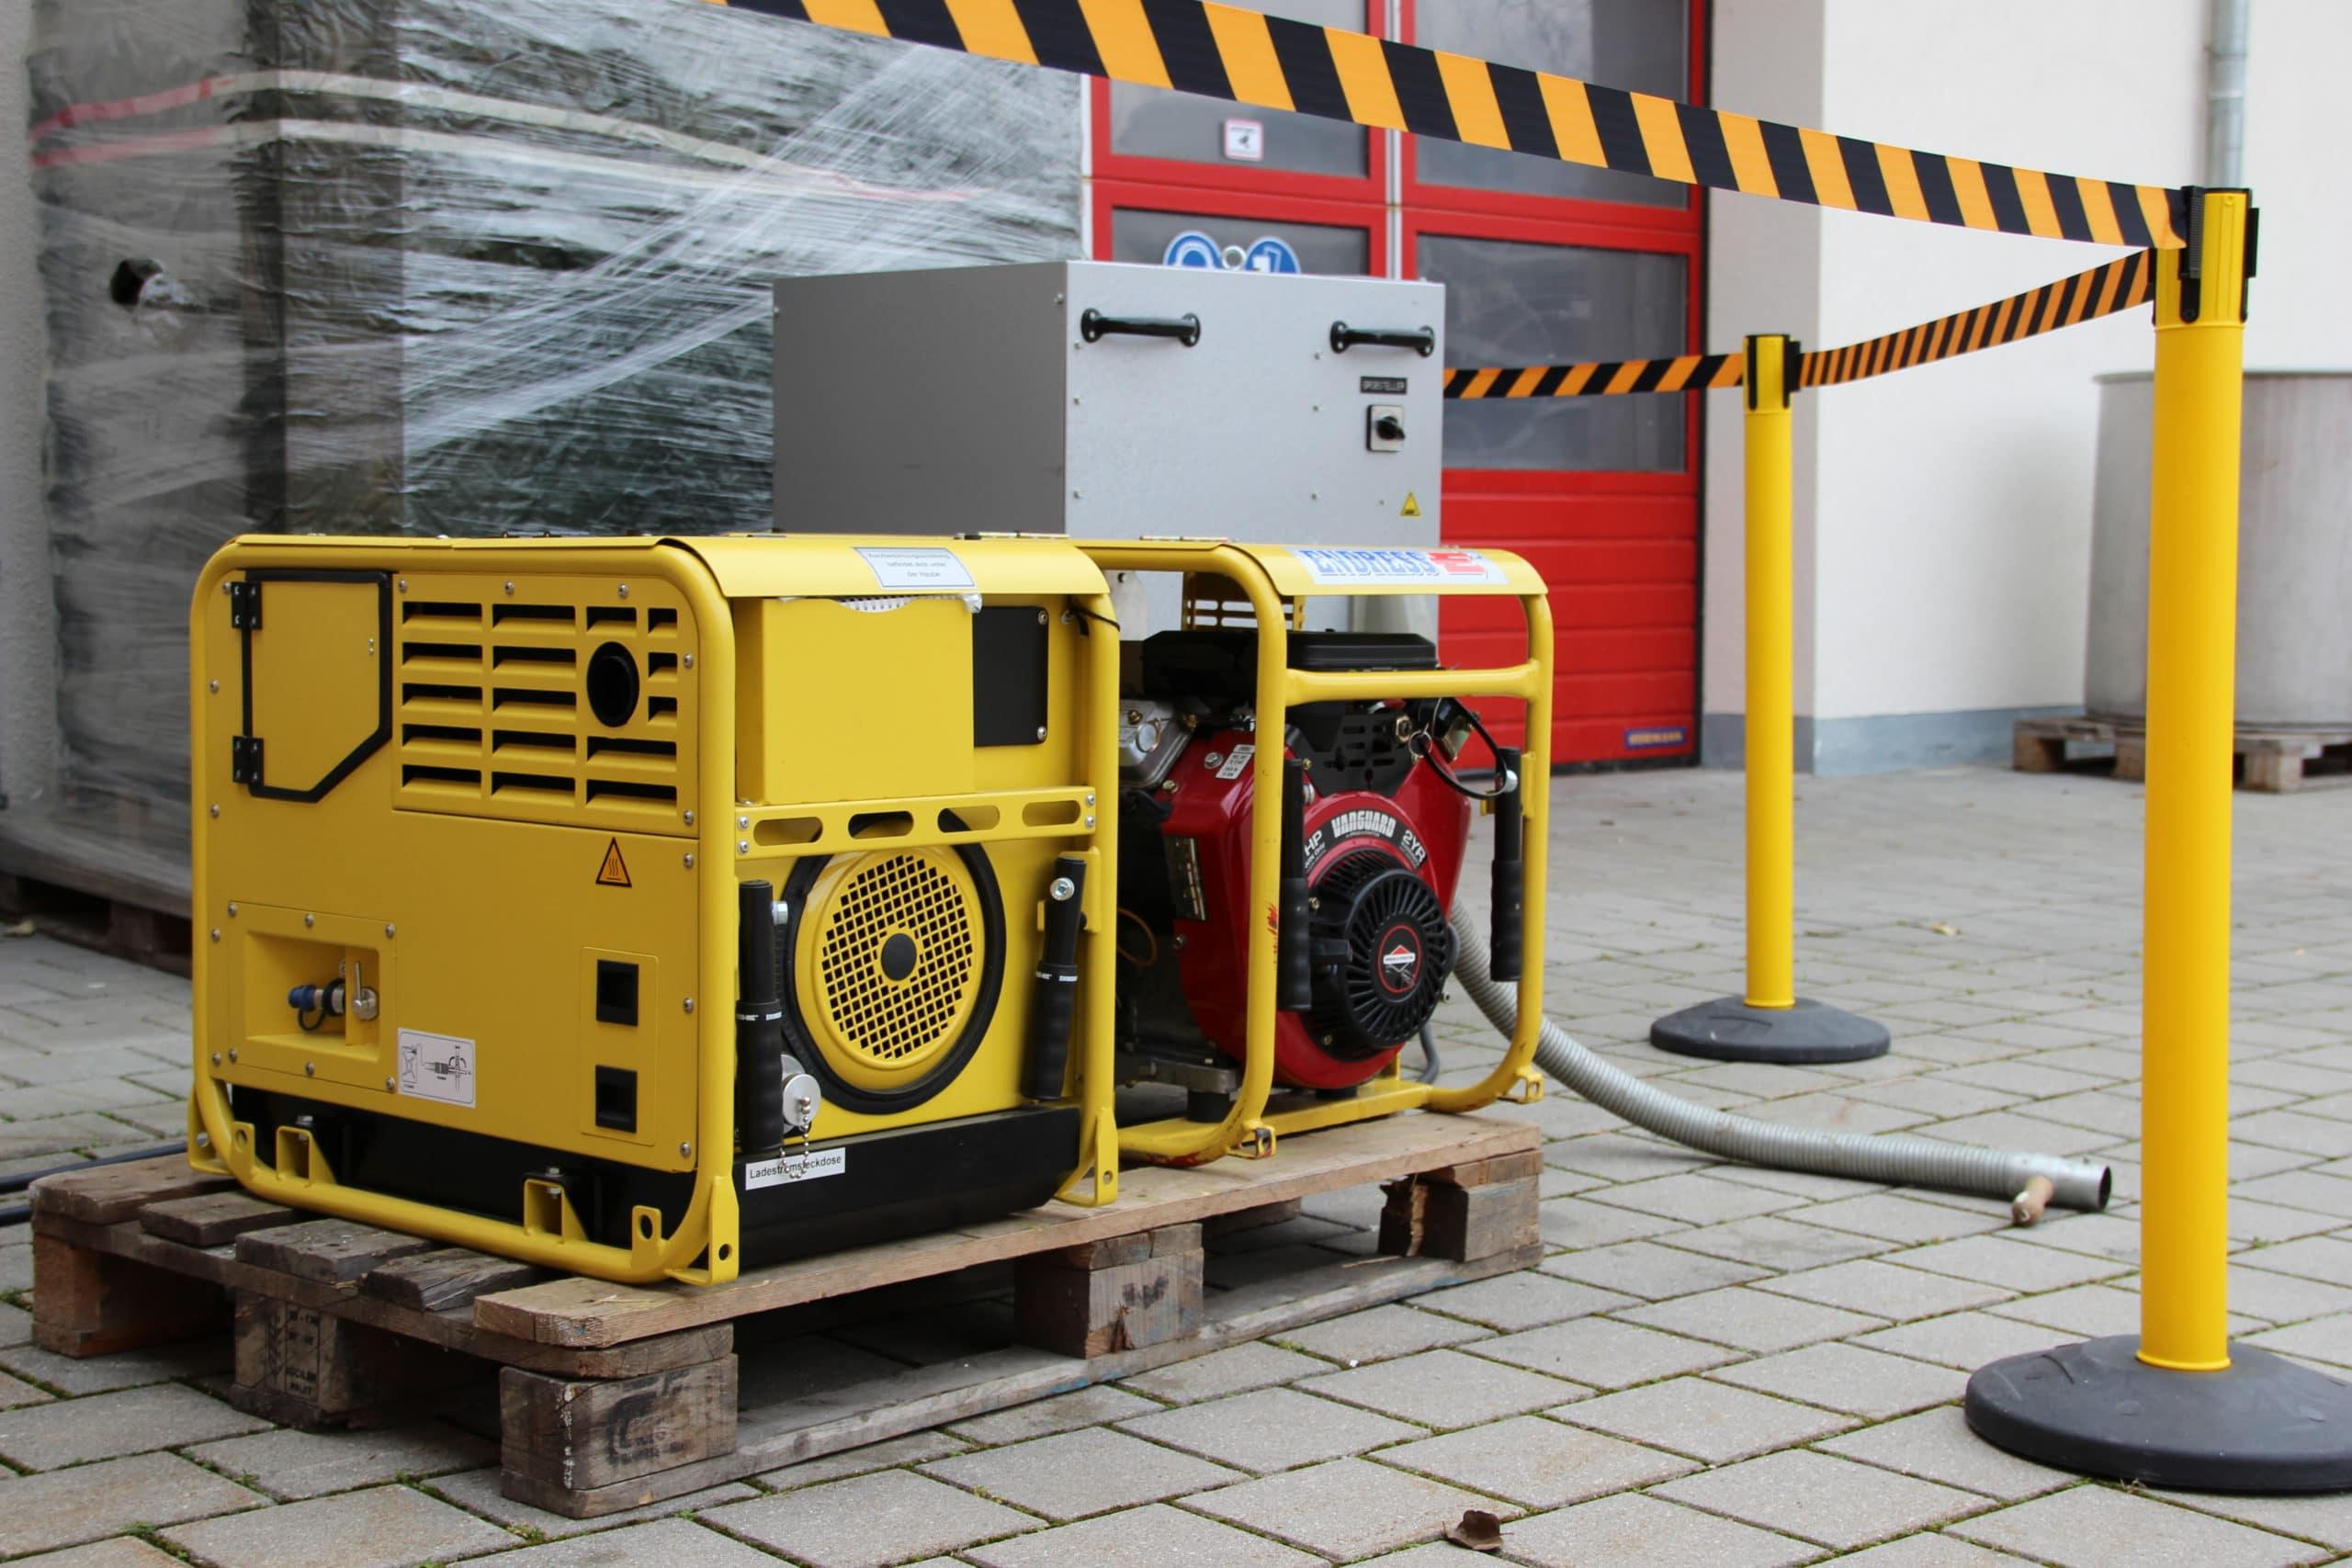 Lastprüfung Stromerzeuger mit Lastsatz 25kVA